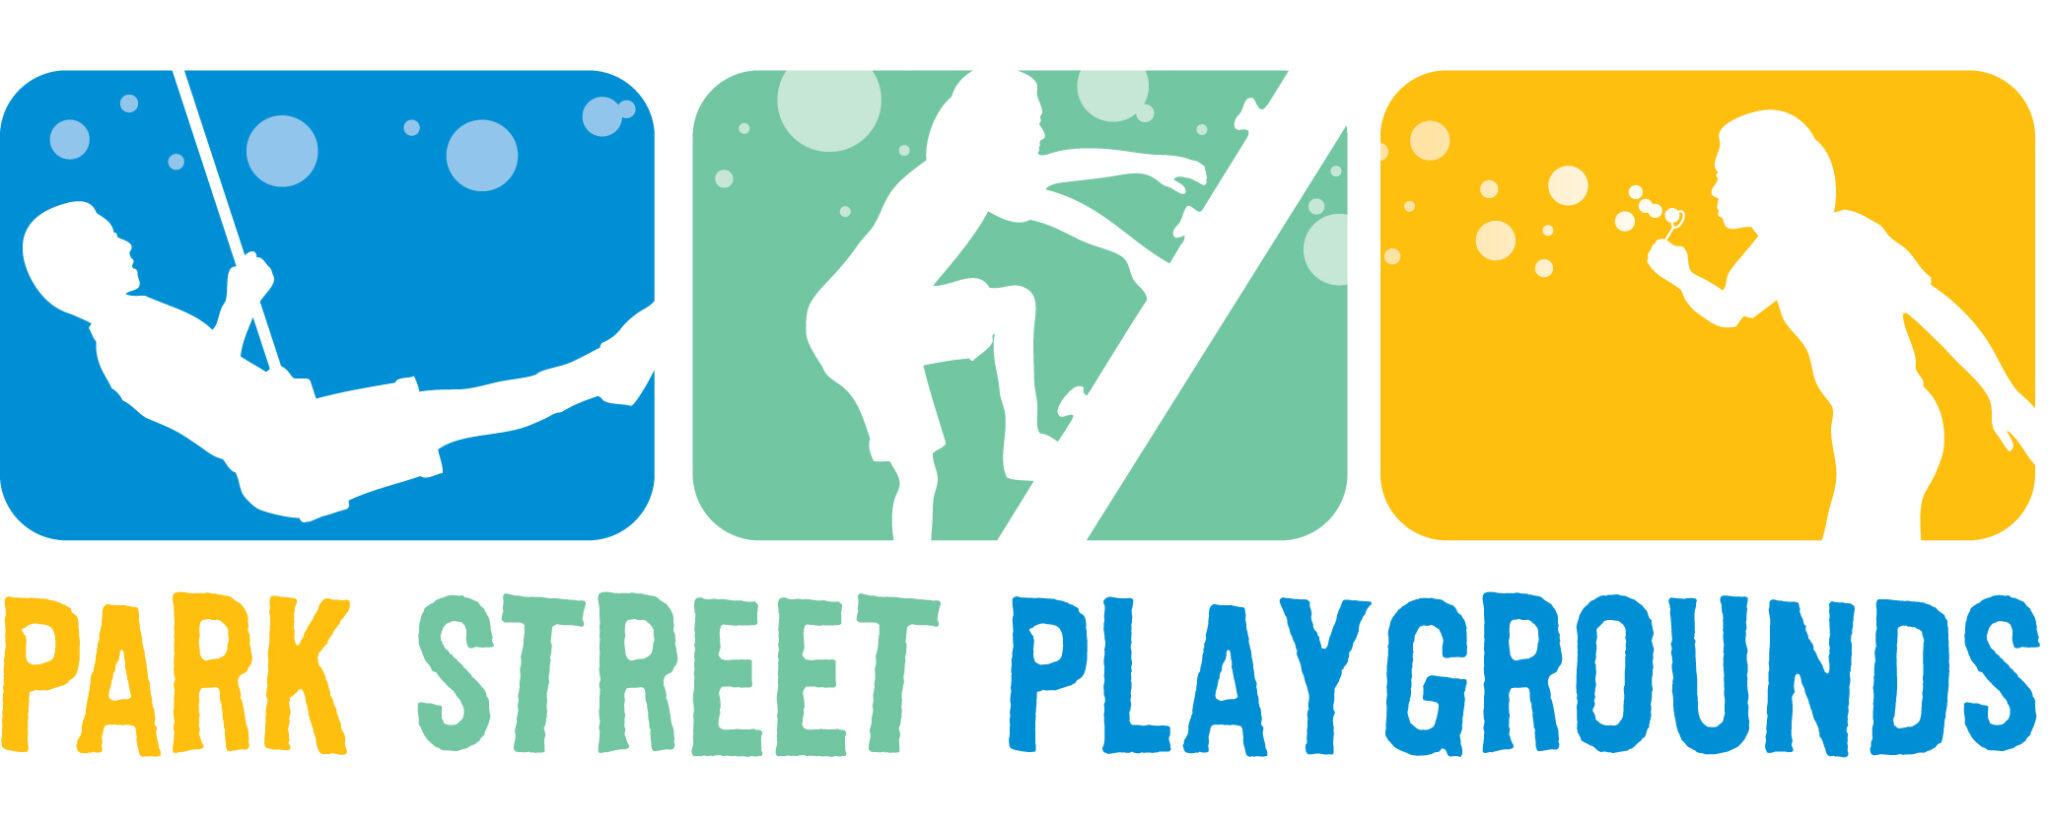 Park Street Playgrounds